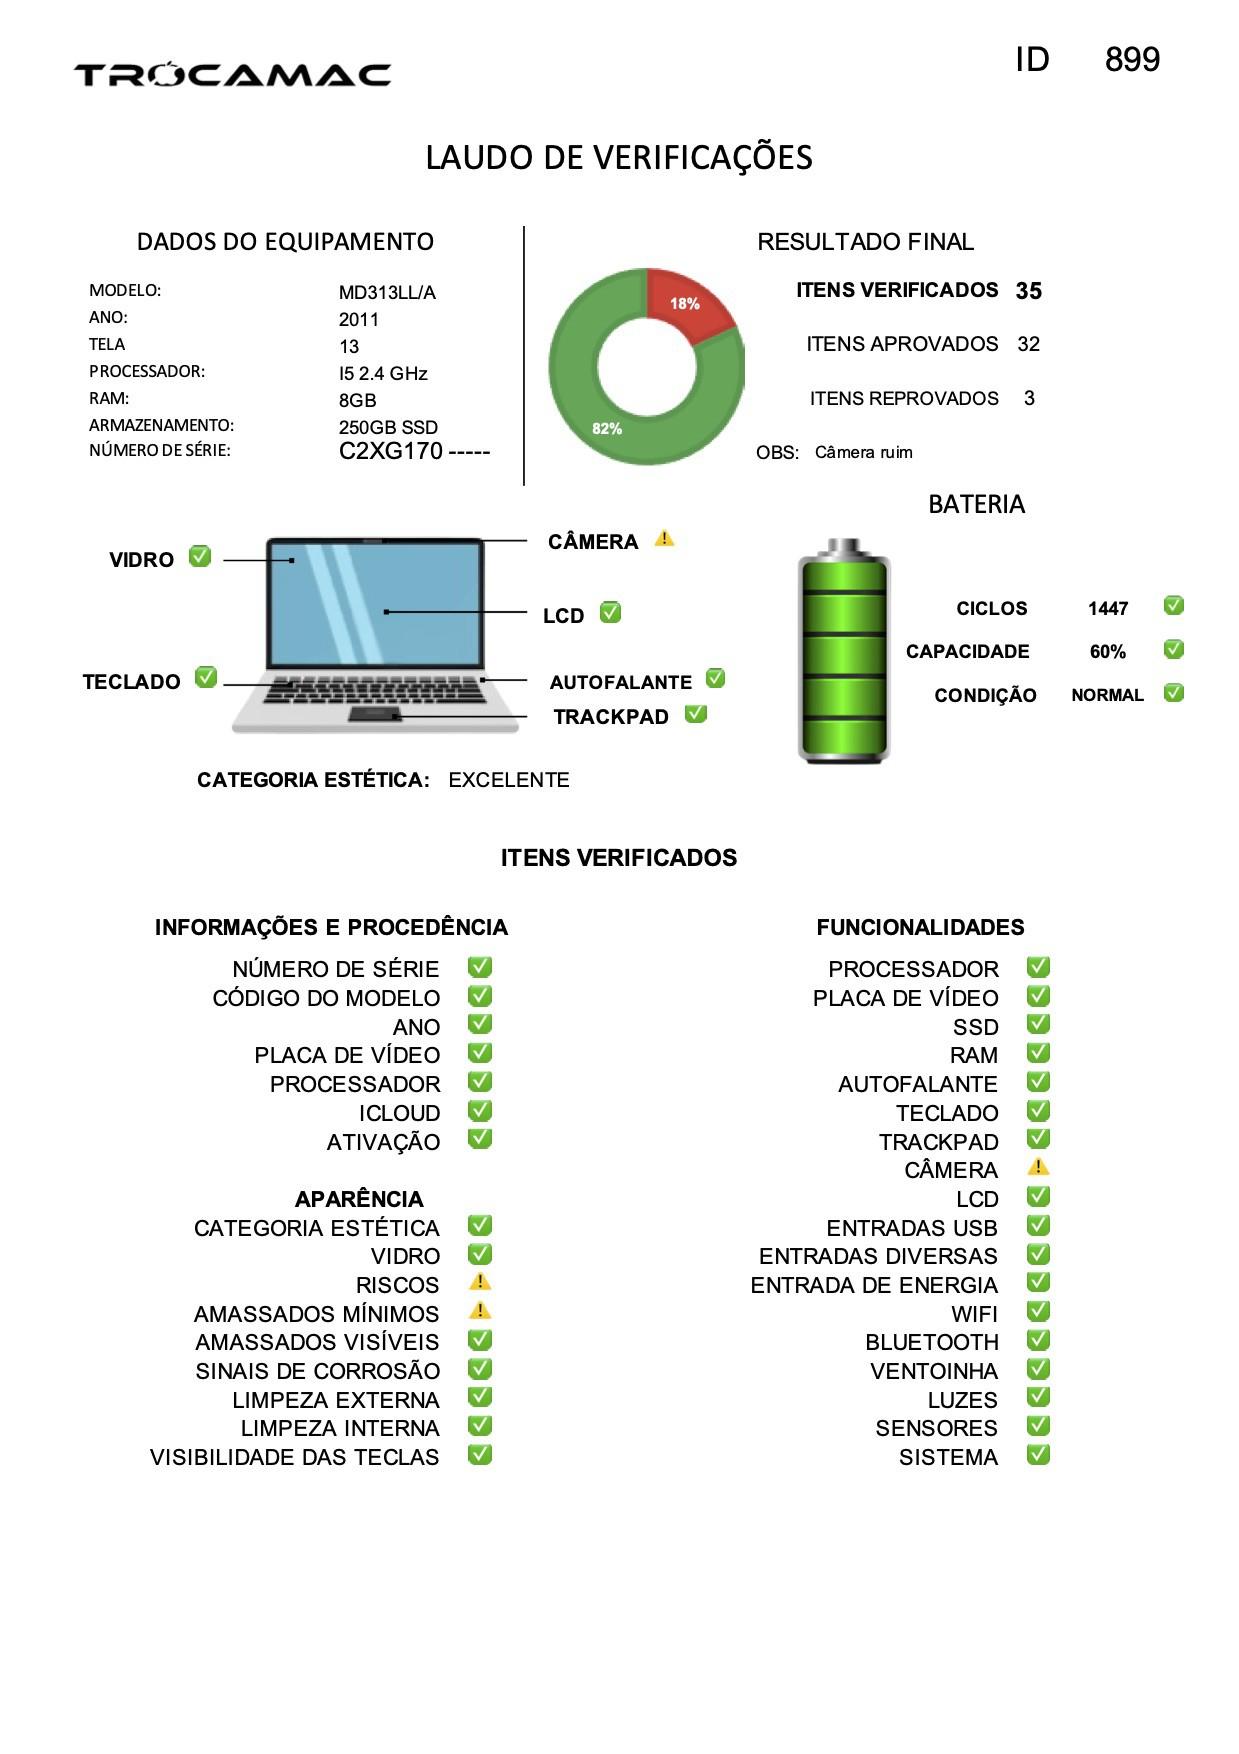 Macbook Pro 13 I5 2.4ghz 8gb 256gb Ssd Md313 Seminovo